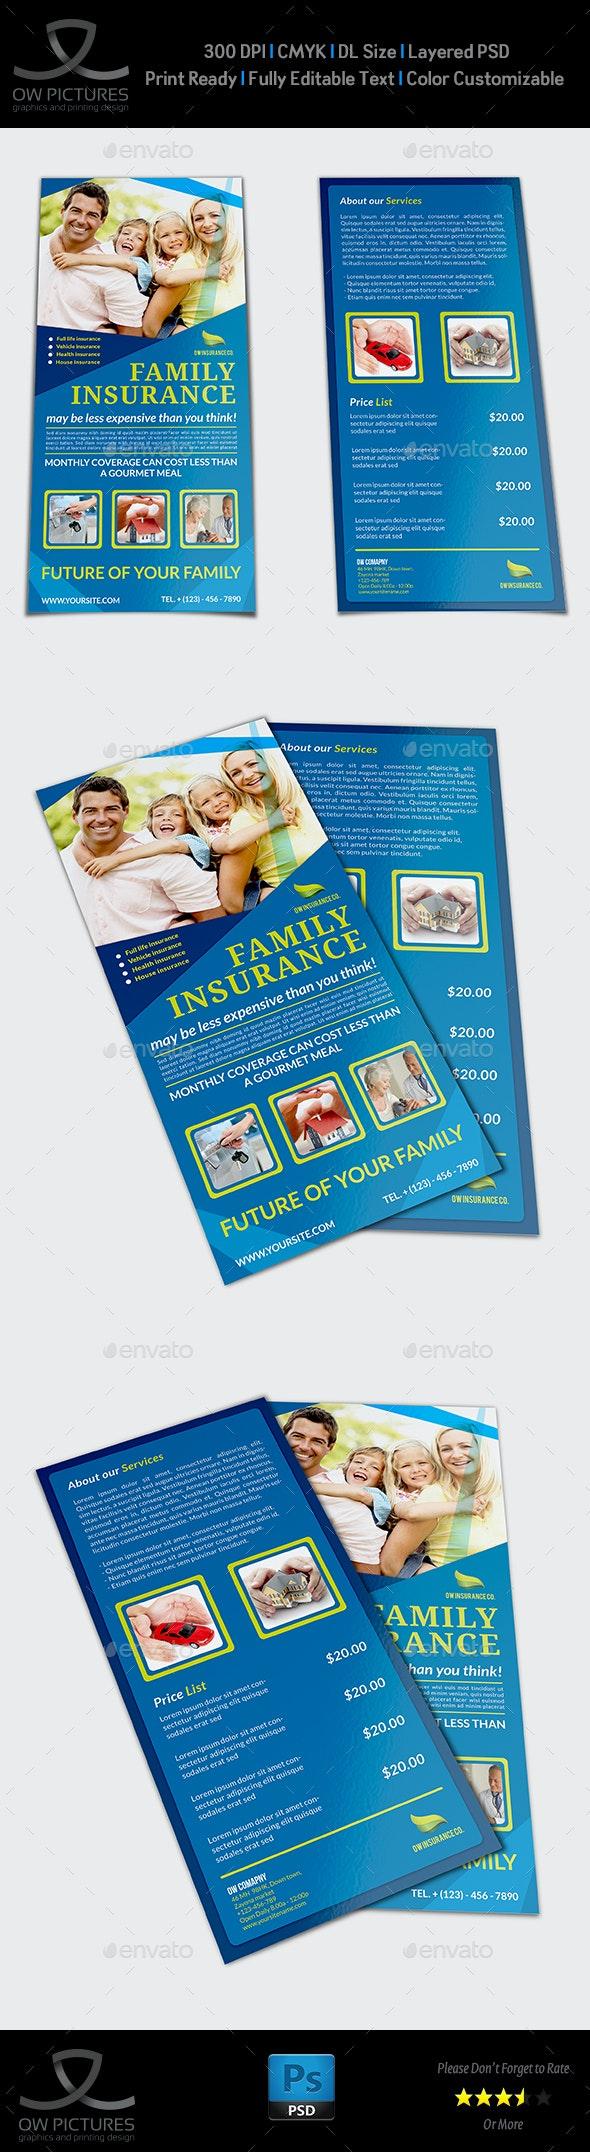 Insurance Flyer Template DL Size - Flyers Print Templates